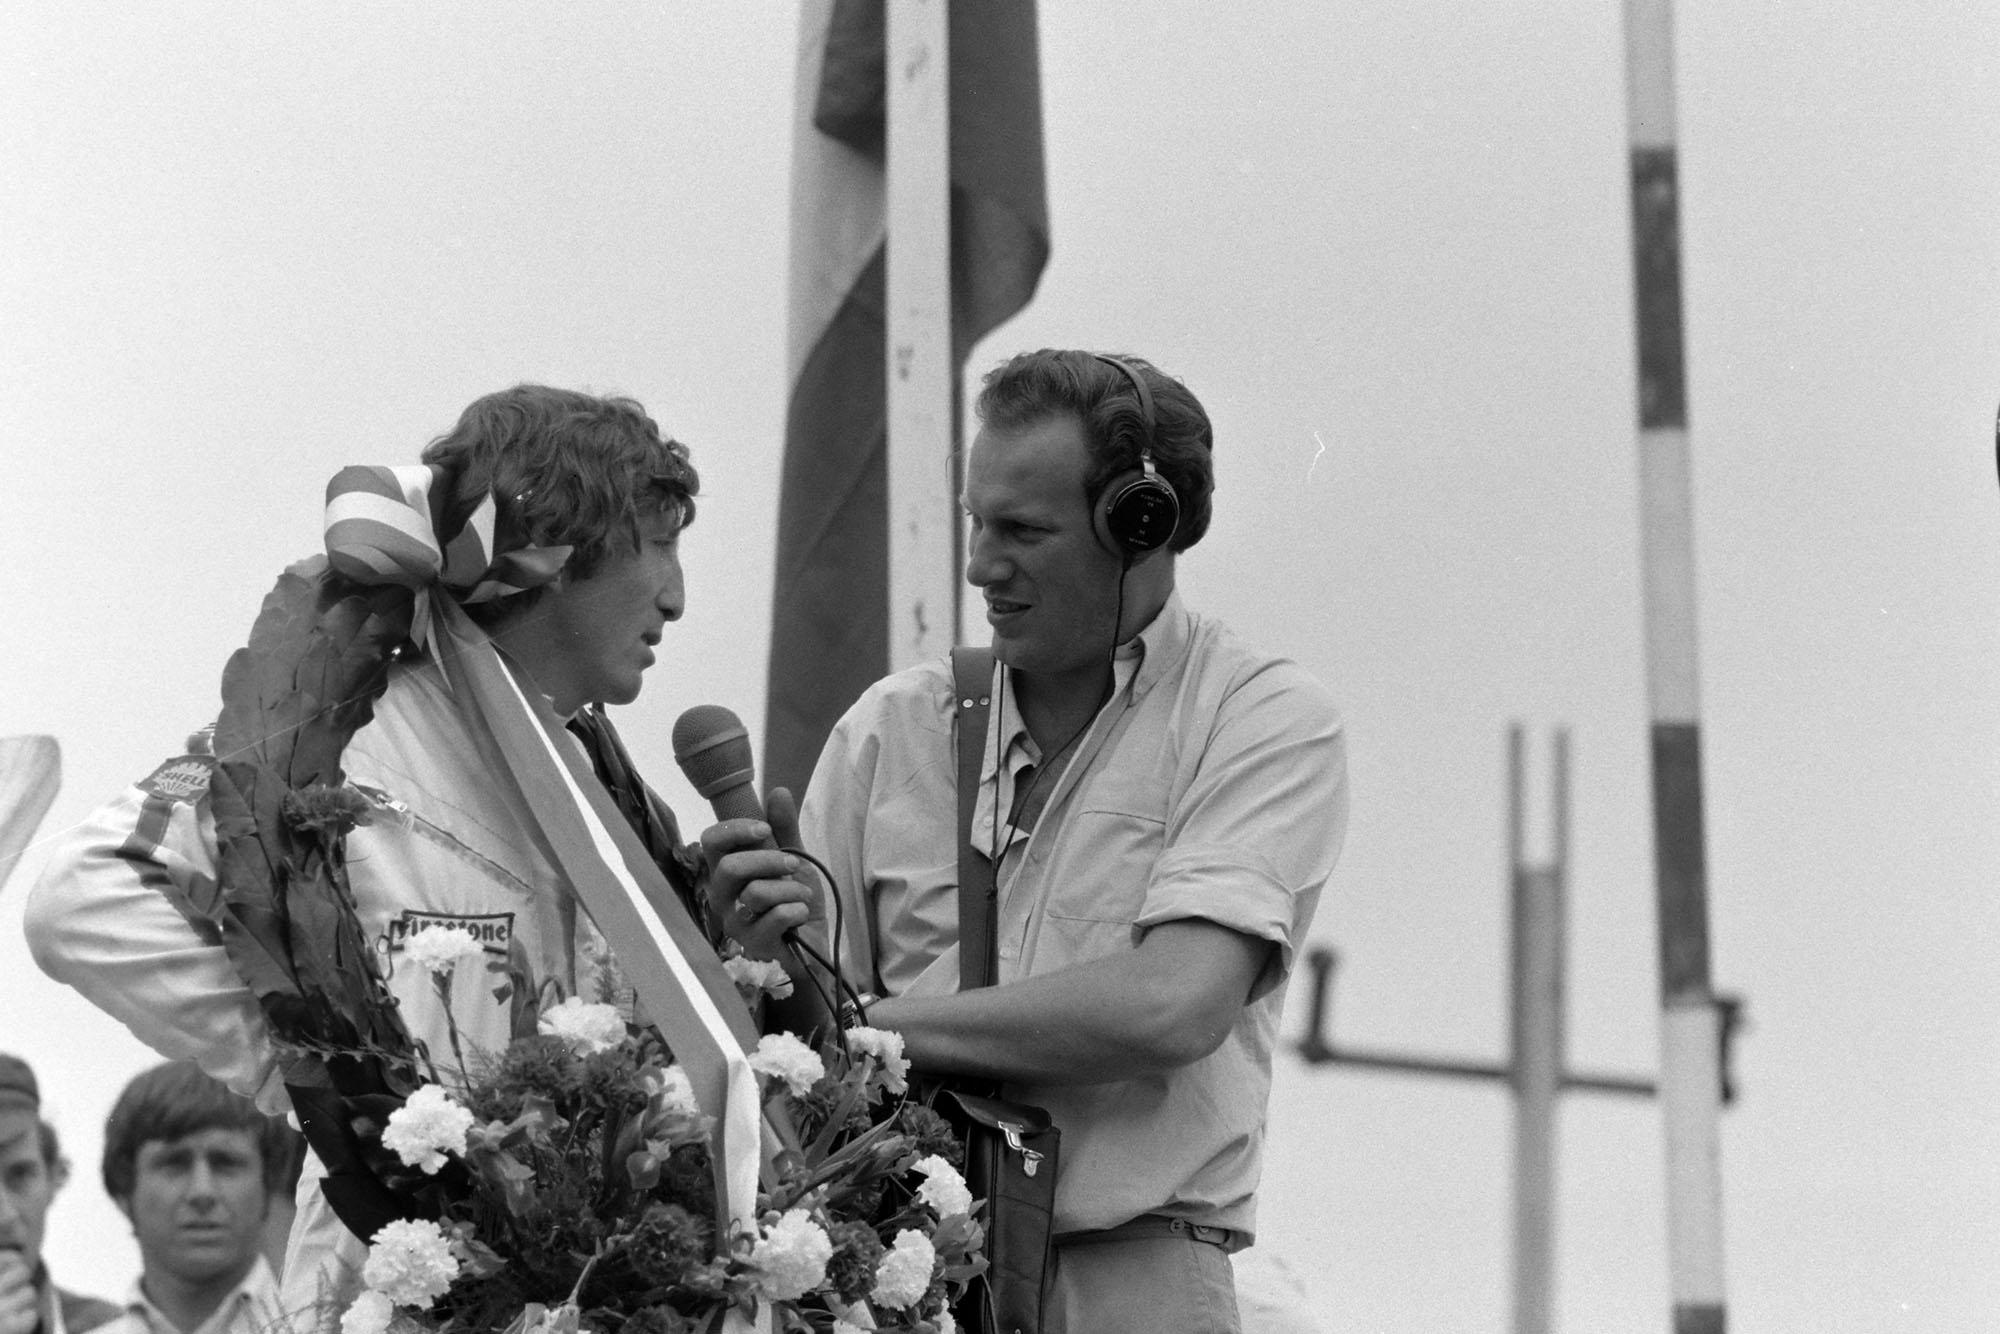 Lotus' Jochen Rindt is interviewed on the podium after winning the 1970 Dutch Grand Prix.